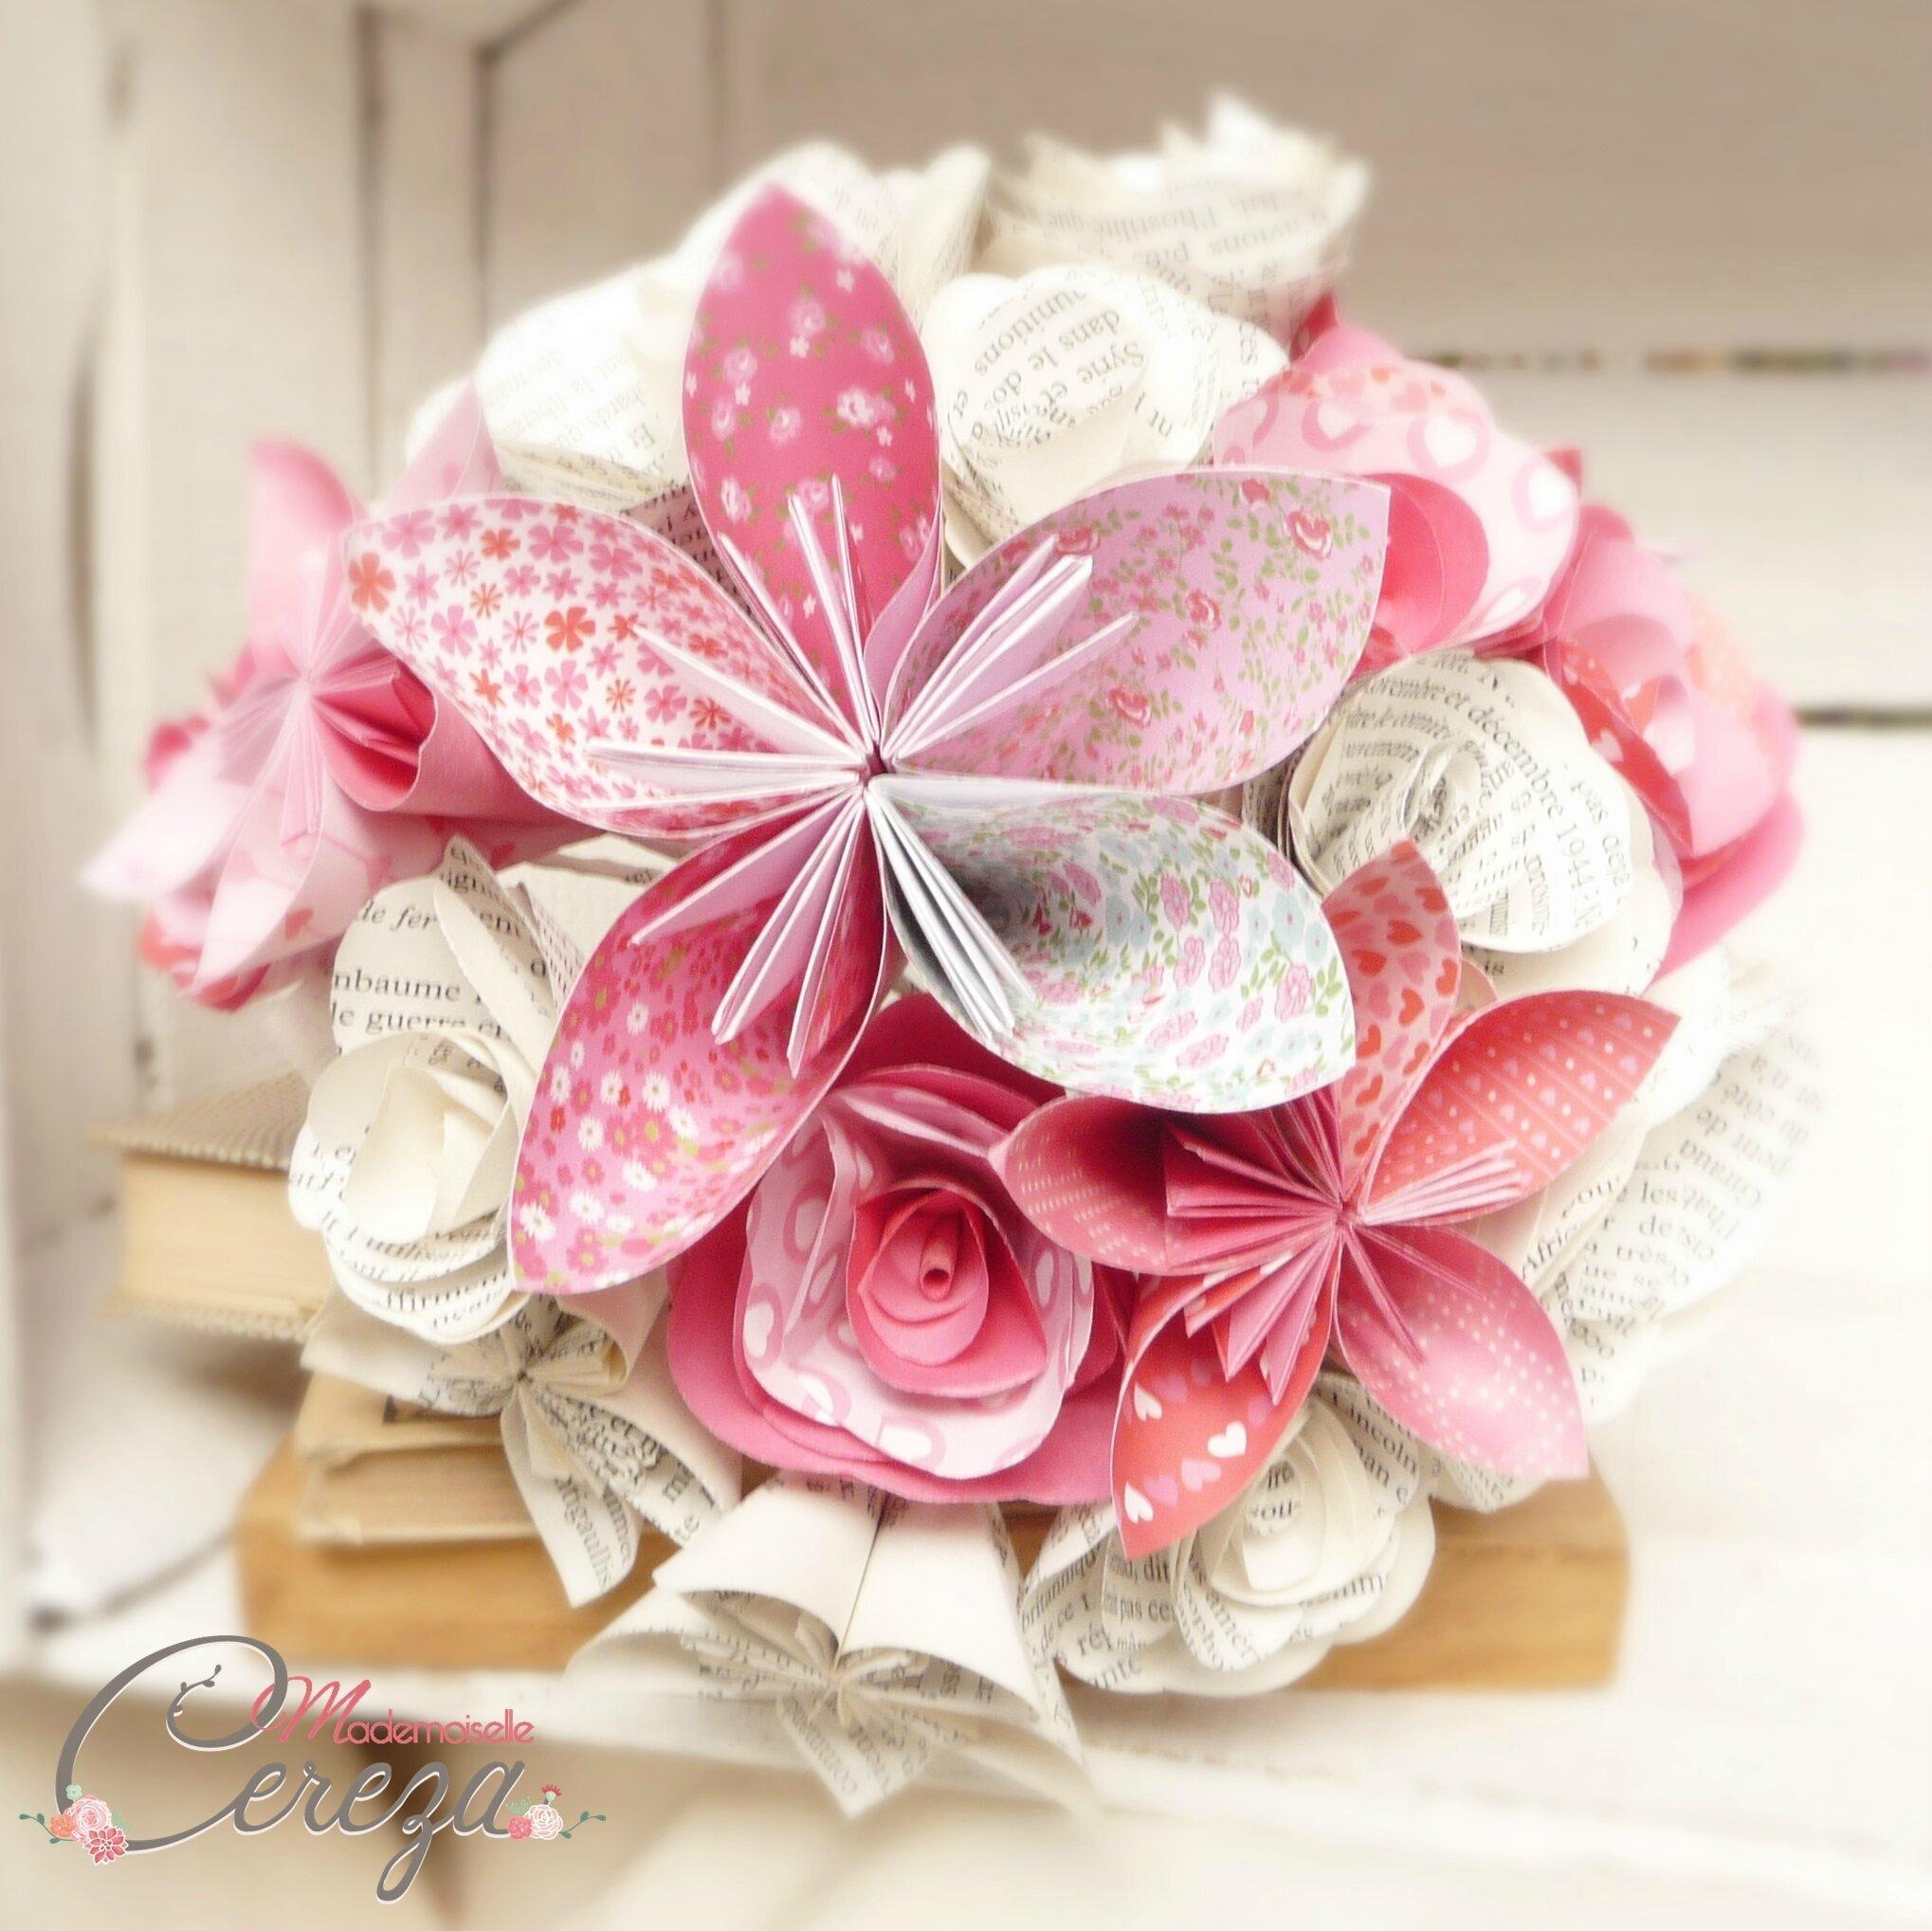 bouquet mariee original atypique papier origami cereza mademoiselle 2